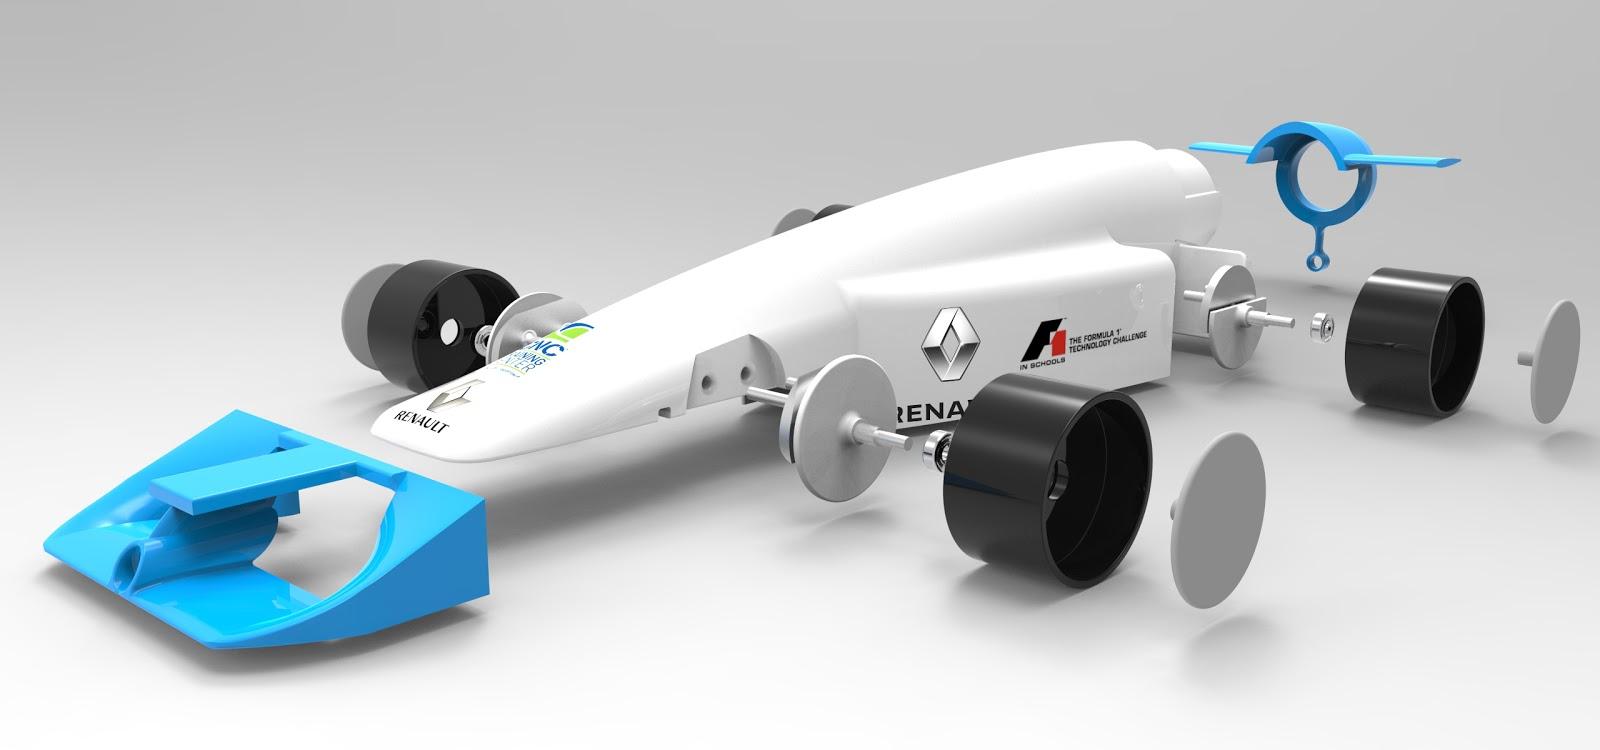 exploded r Μαθητές απ' όλο τον κόσμο δημιουργούν τις δικές τους ομάδες στα πρότυπα της F1 F1, Renault, videos, Τεχνολογία